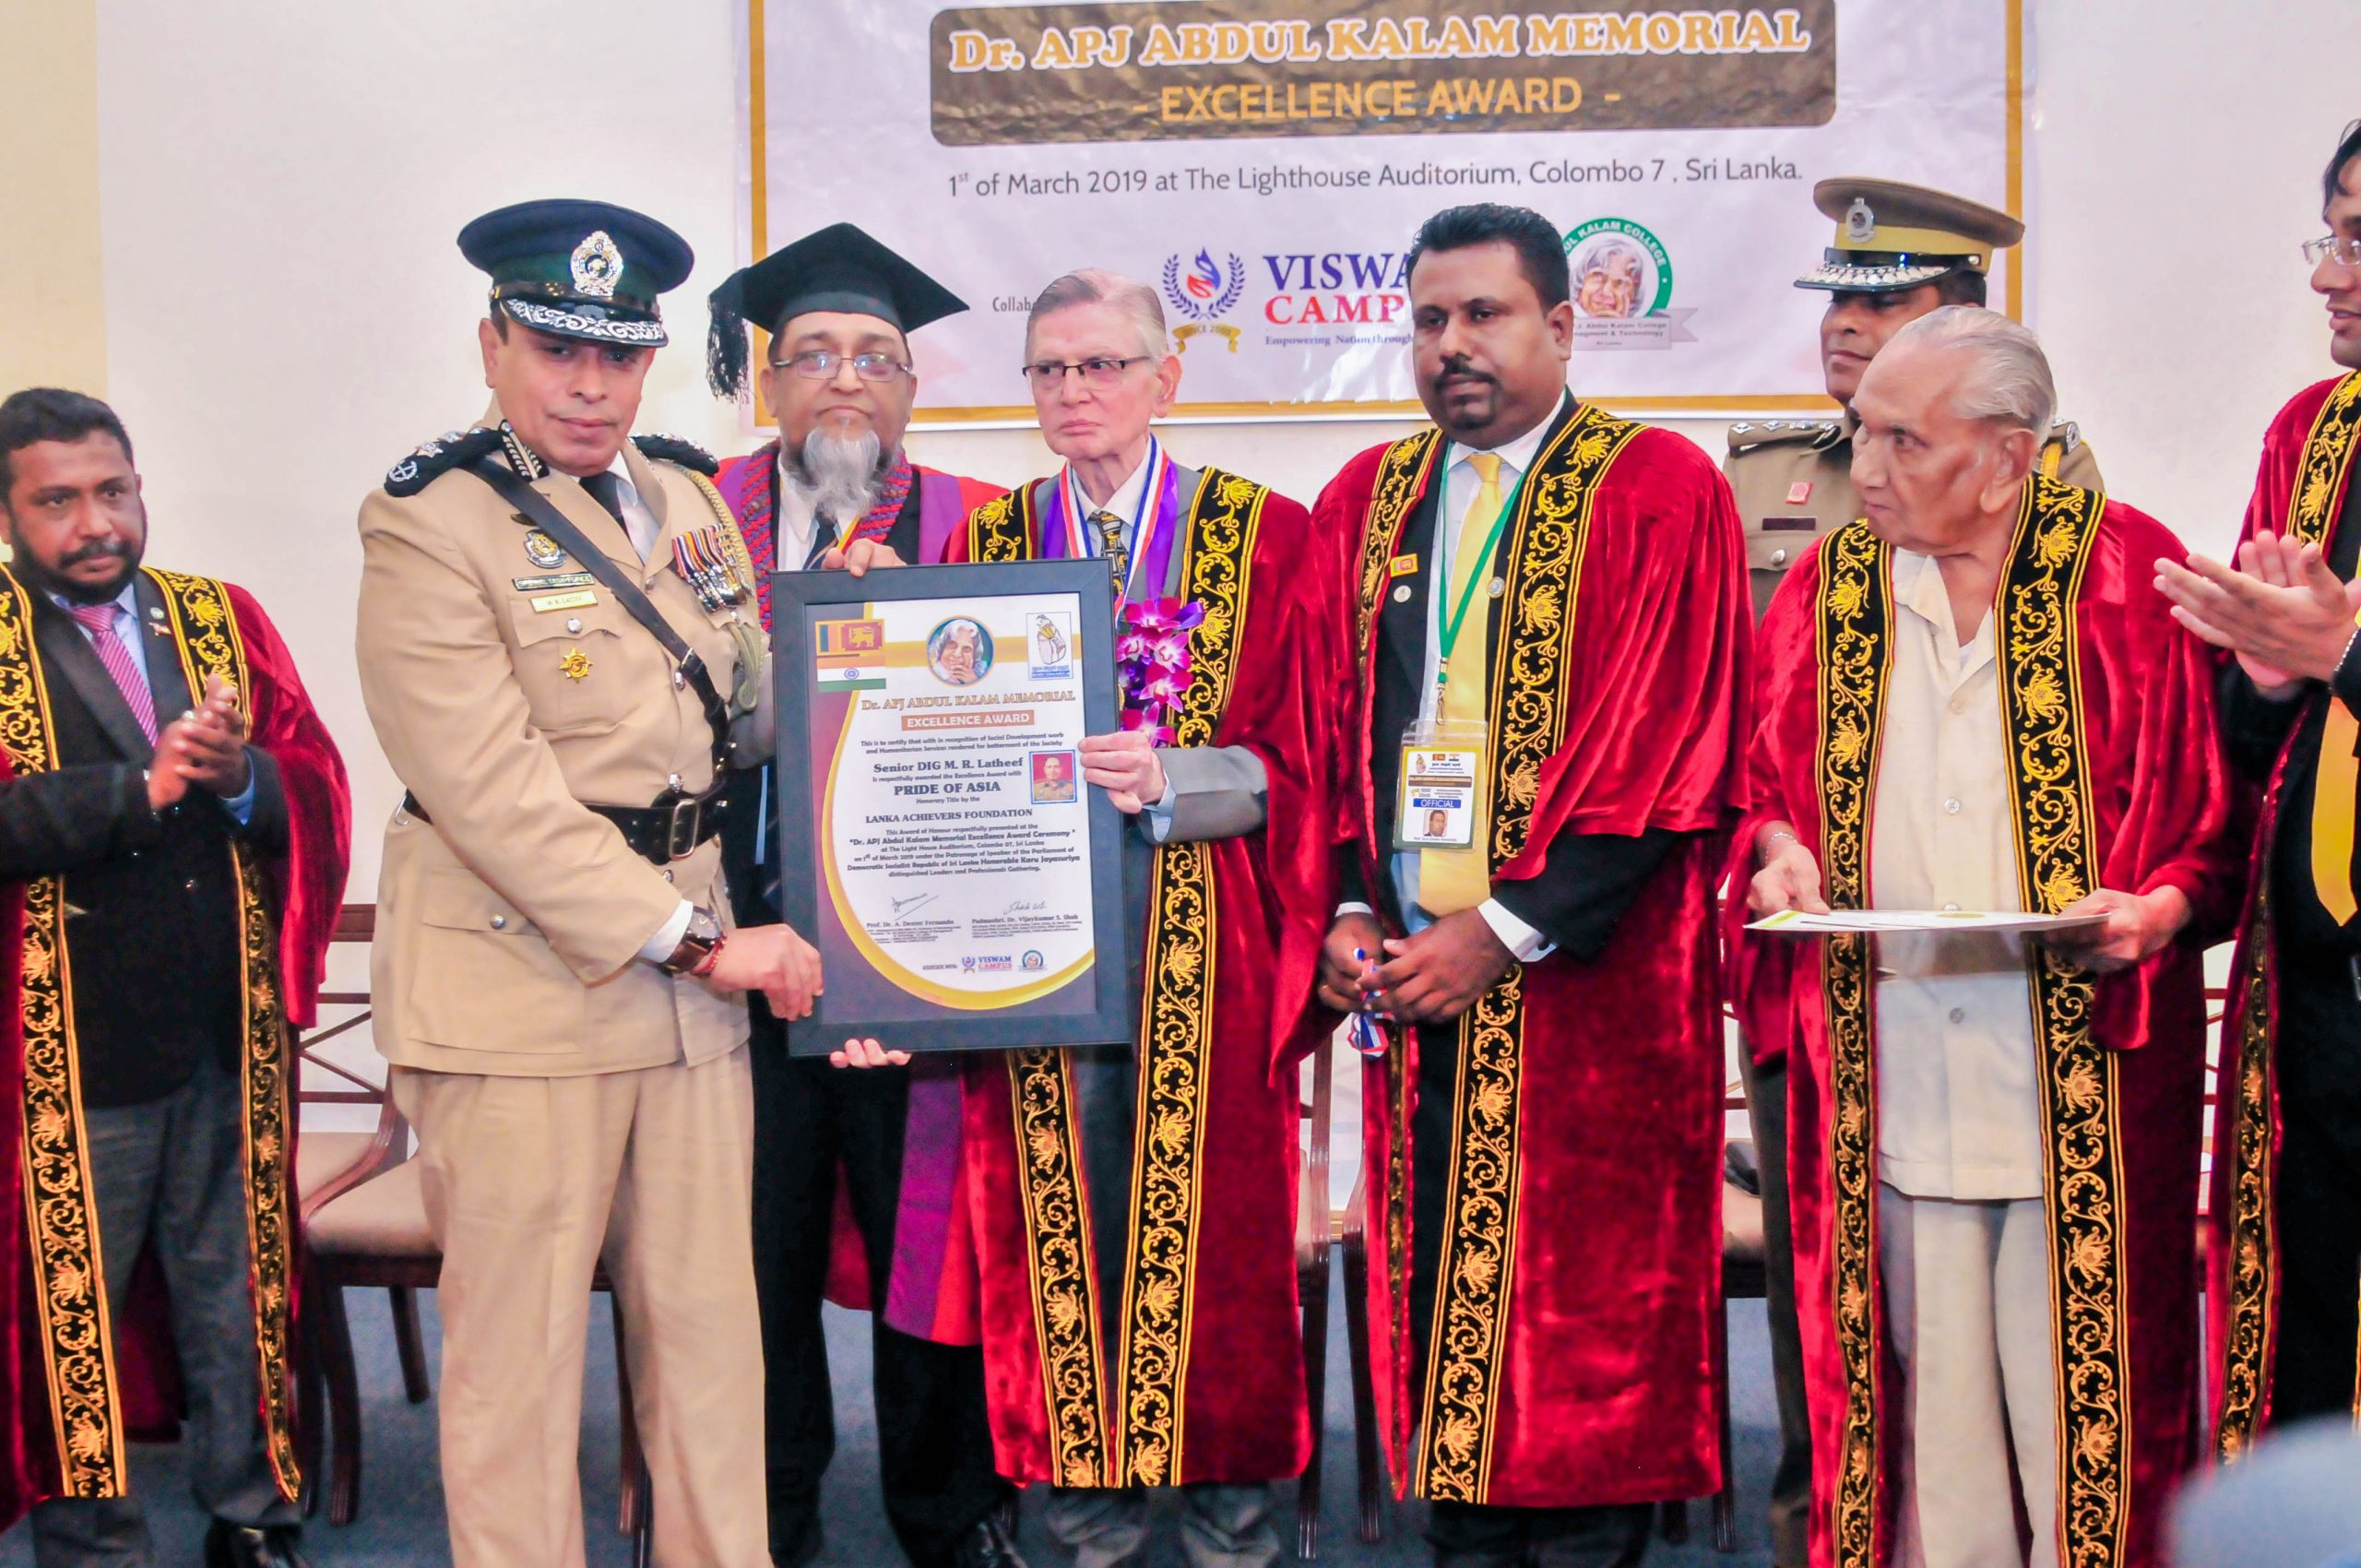 Dr. Abdul Kalam 2019 (28)